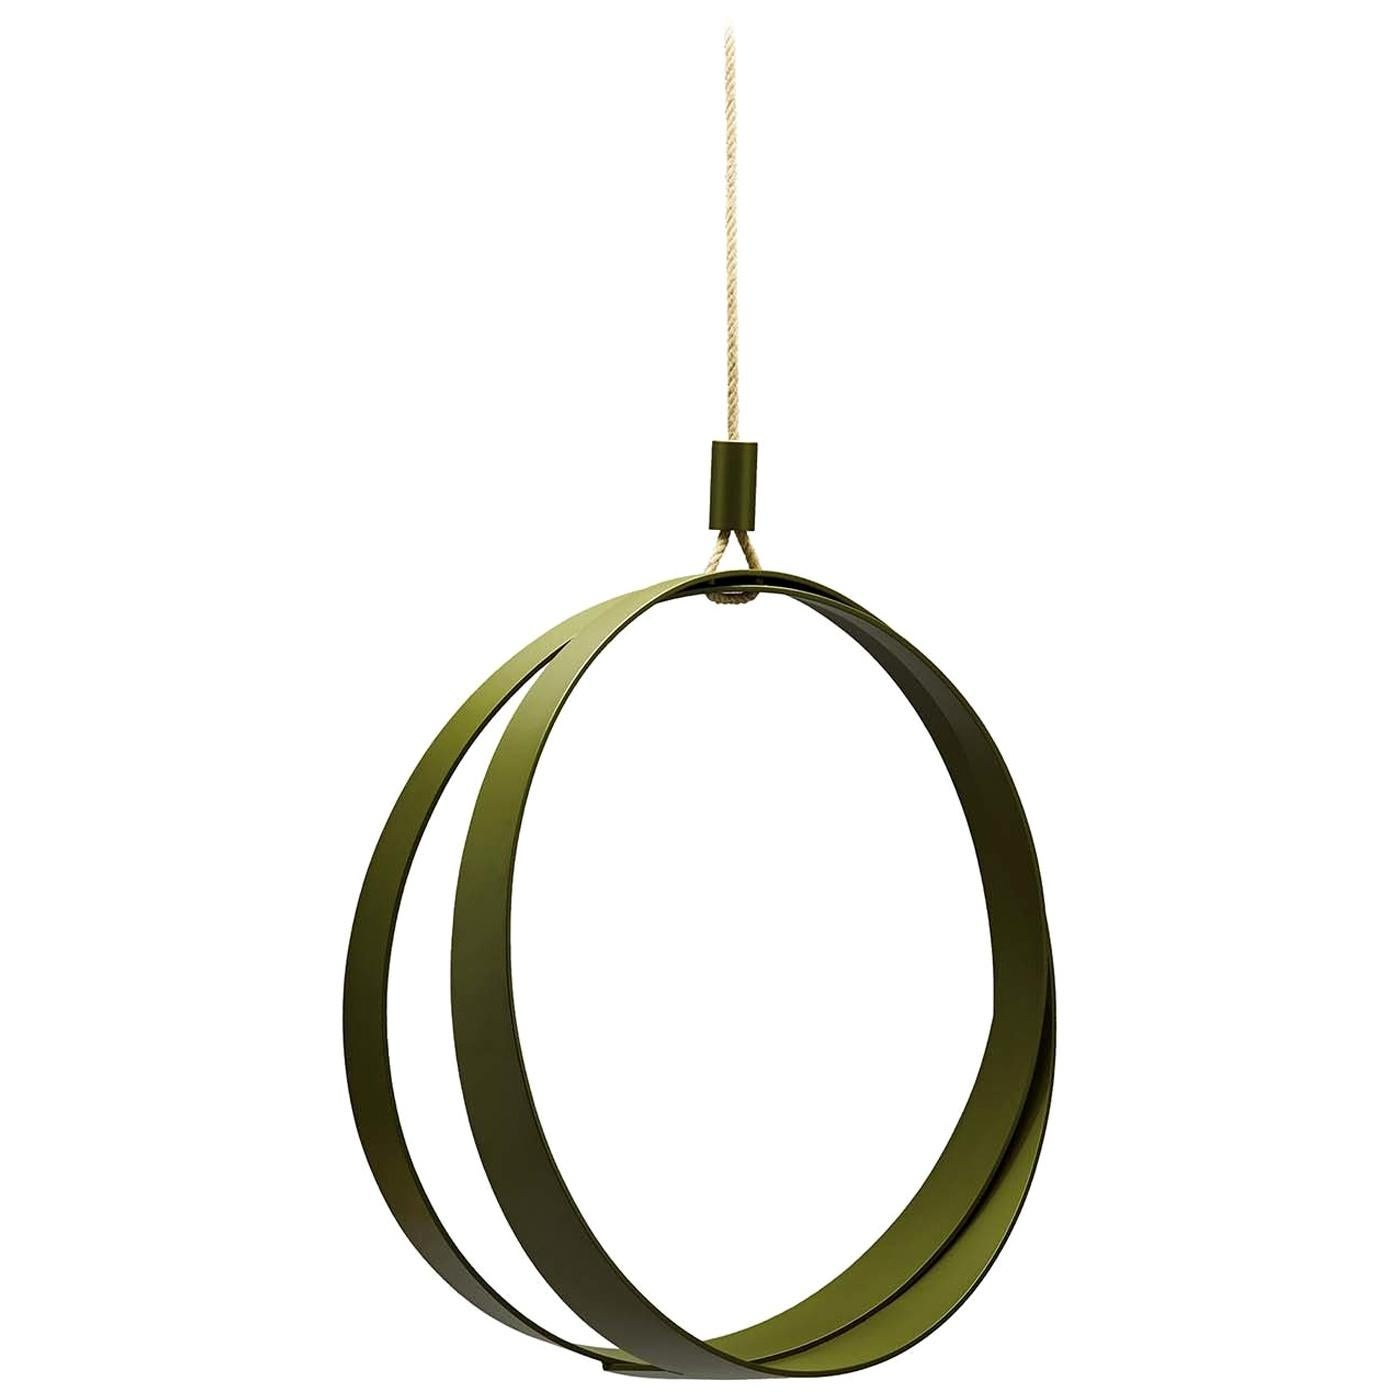 Ring-O Swing Chair